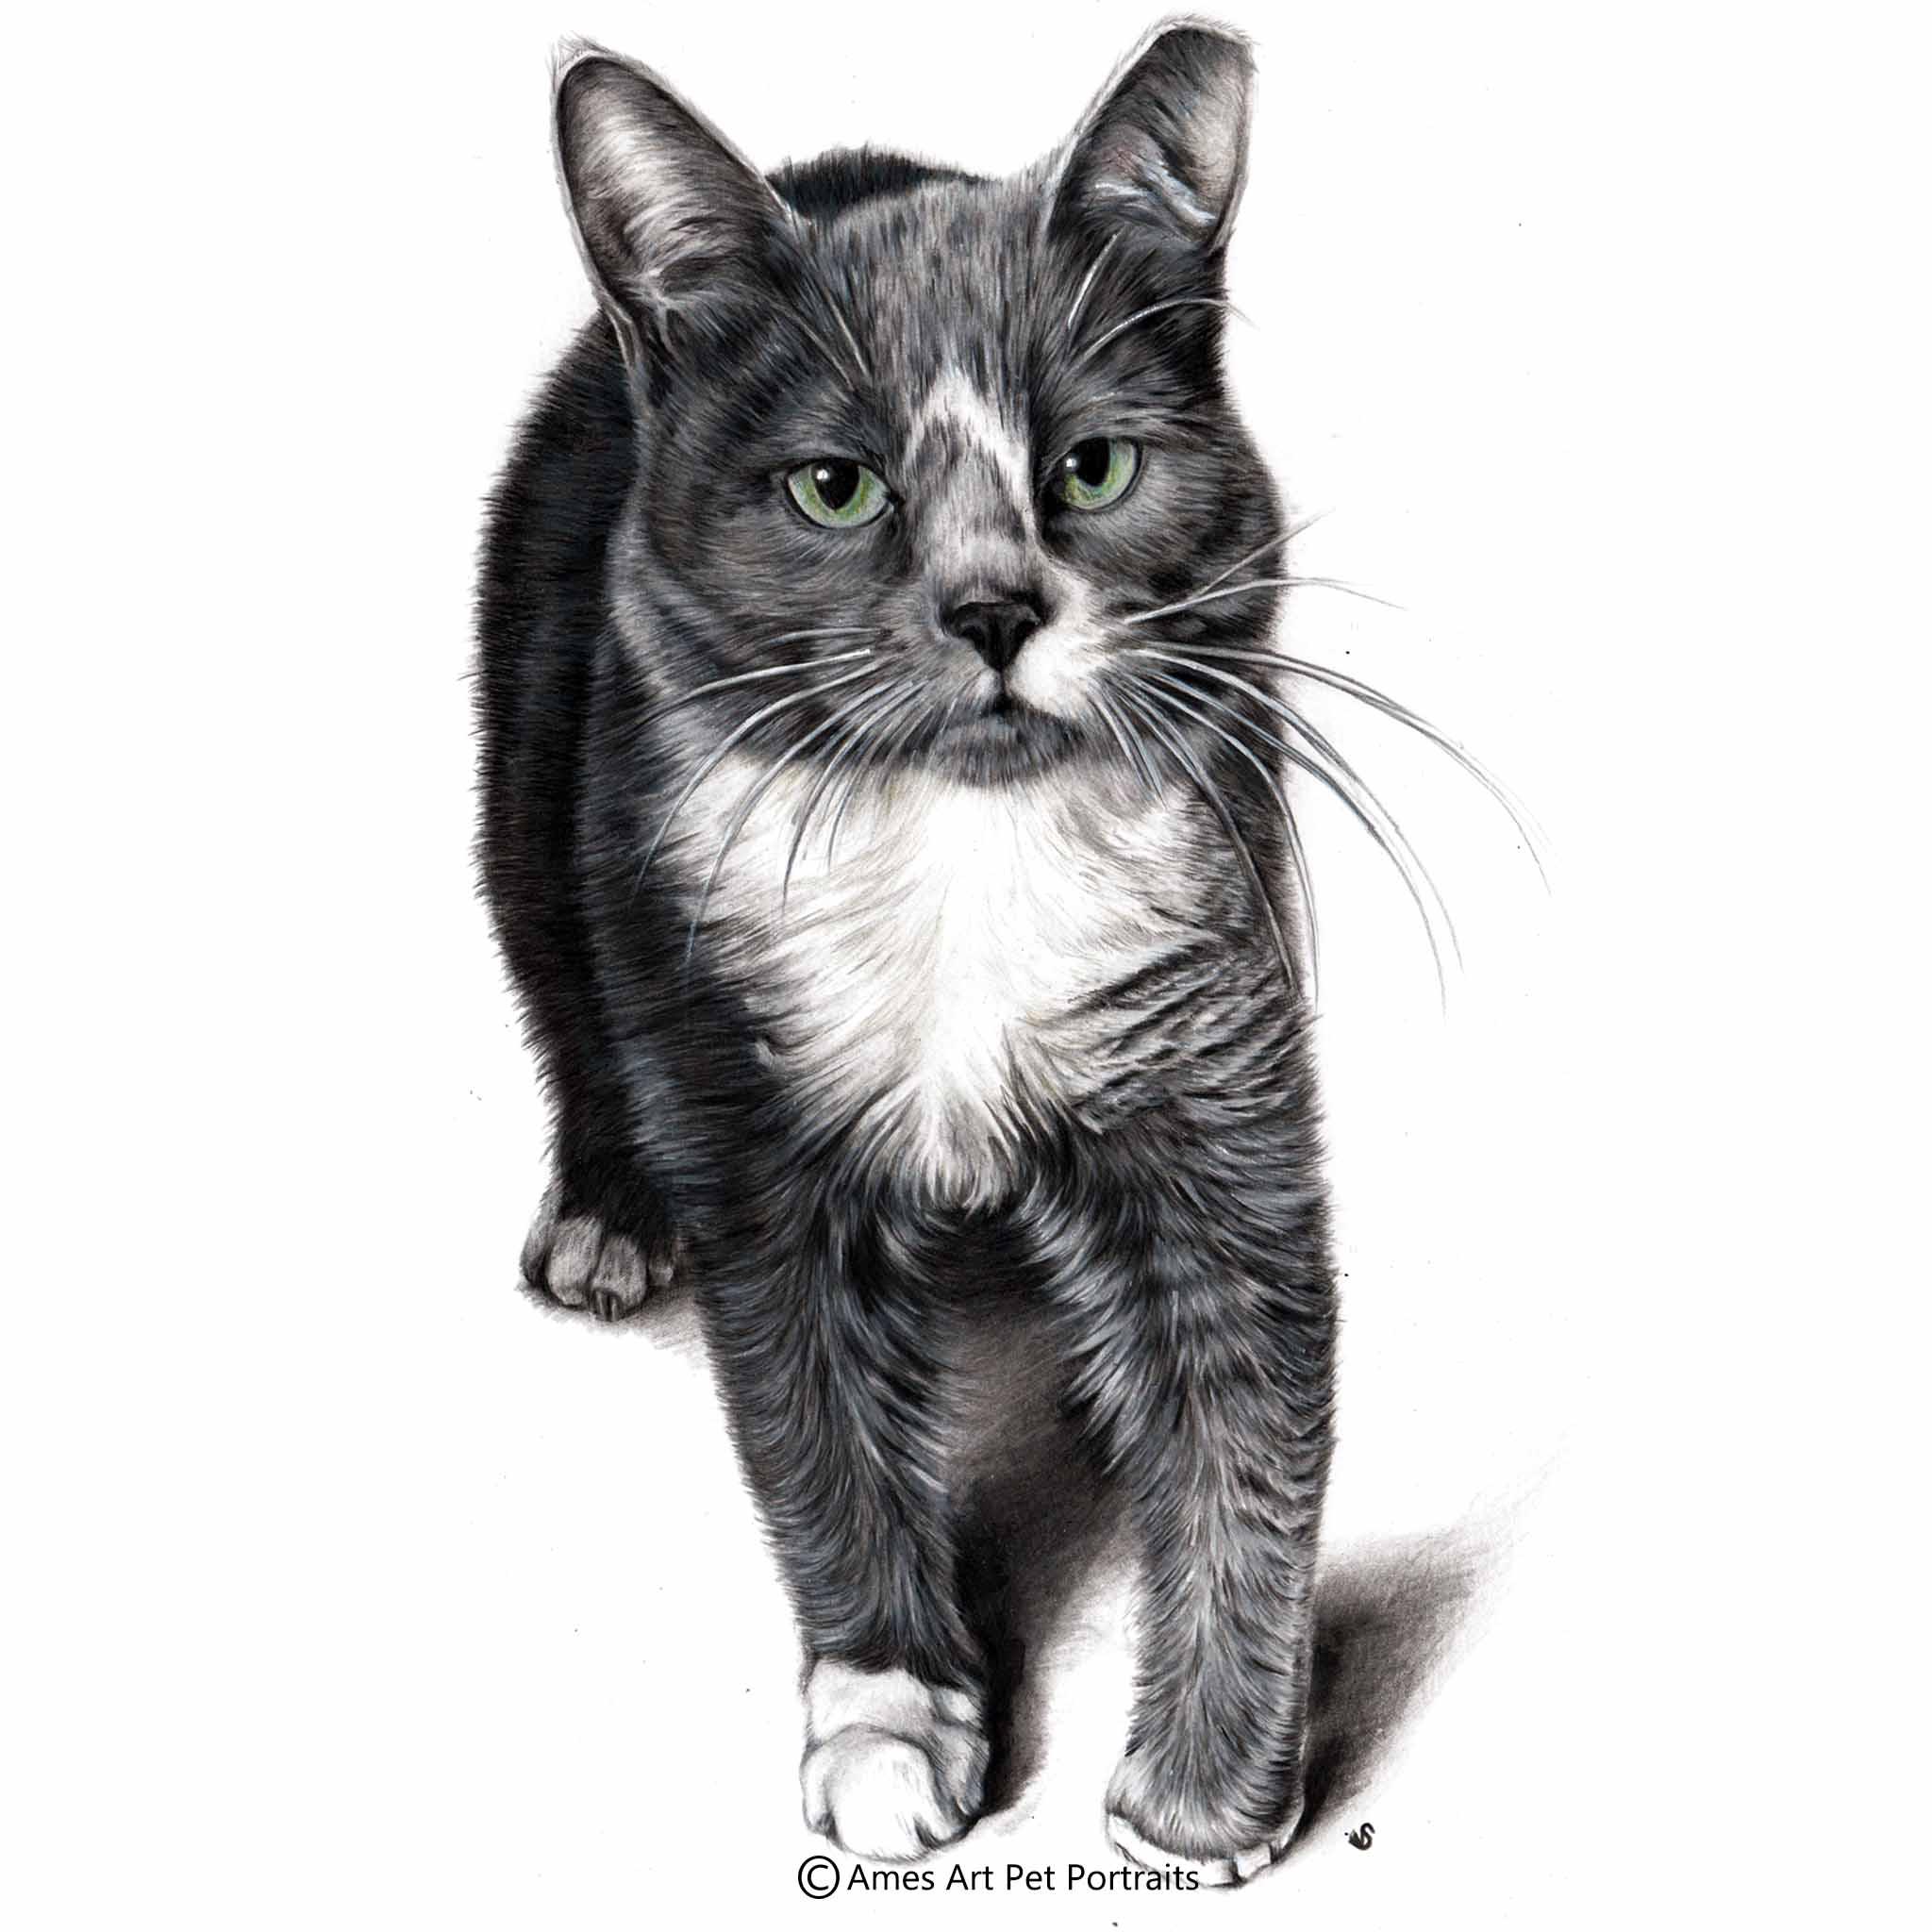 'Patches' - USA, 11.7 x 16.5 in, 2017, Color Pencil Cat Portrait